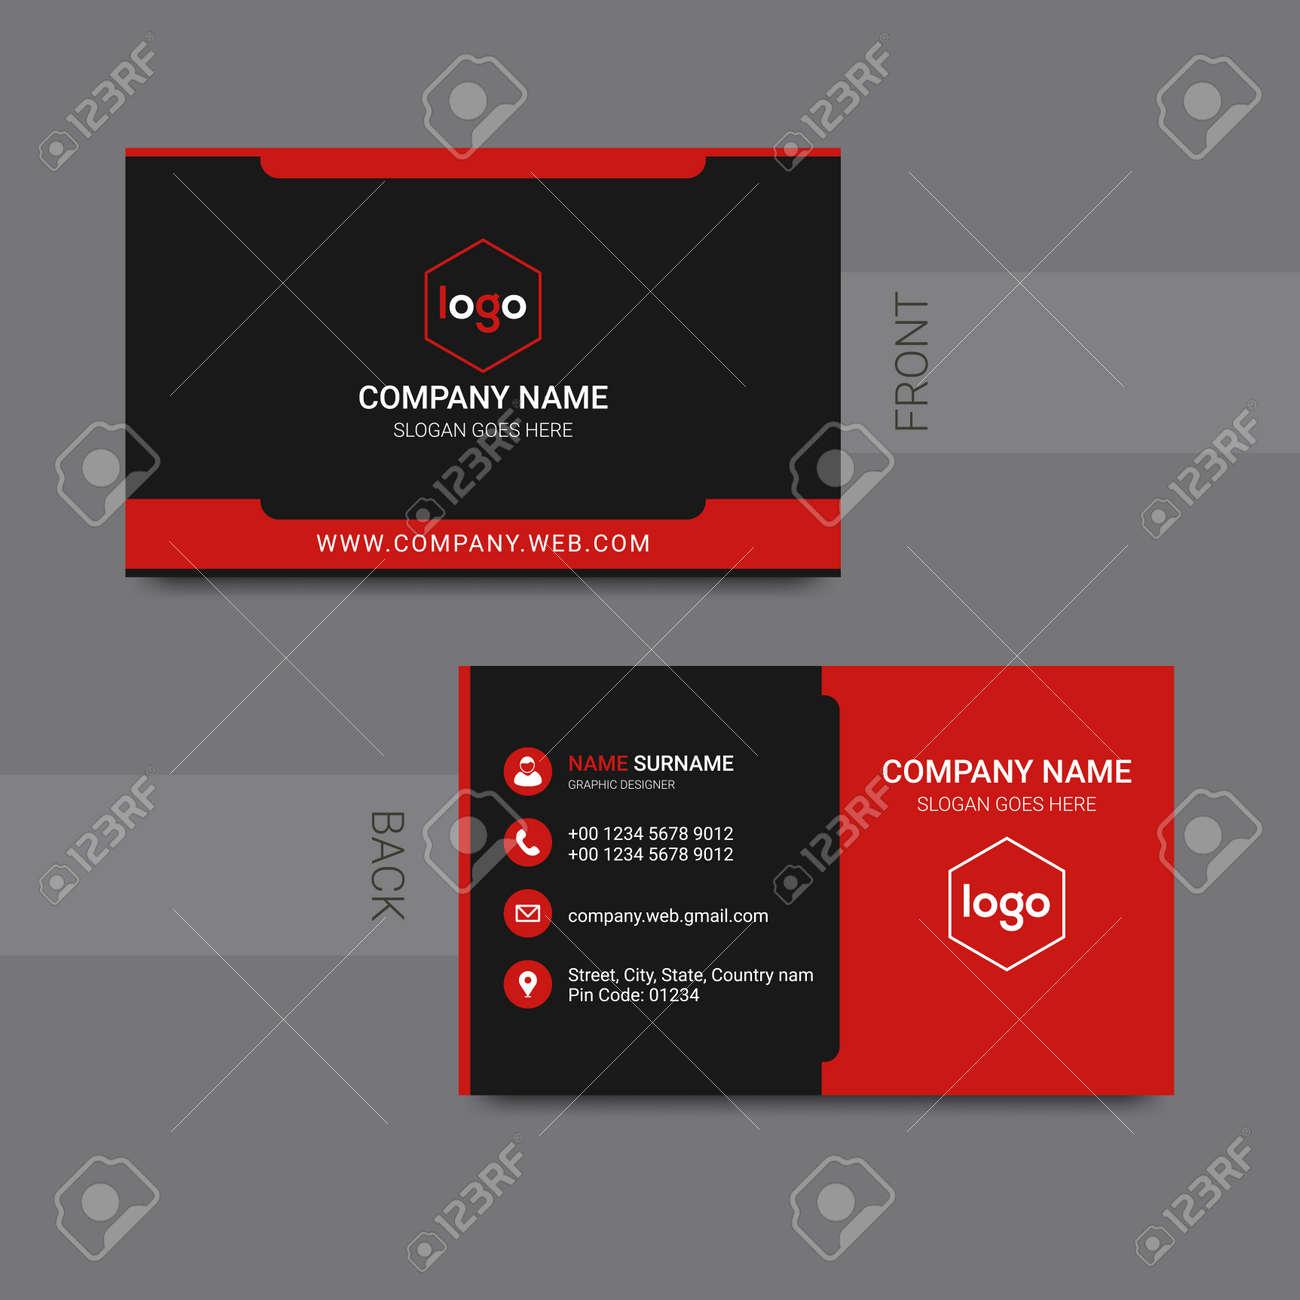 Modern professional business card design vector. Vector illustration. - 168074131